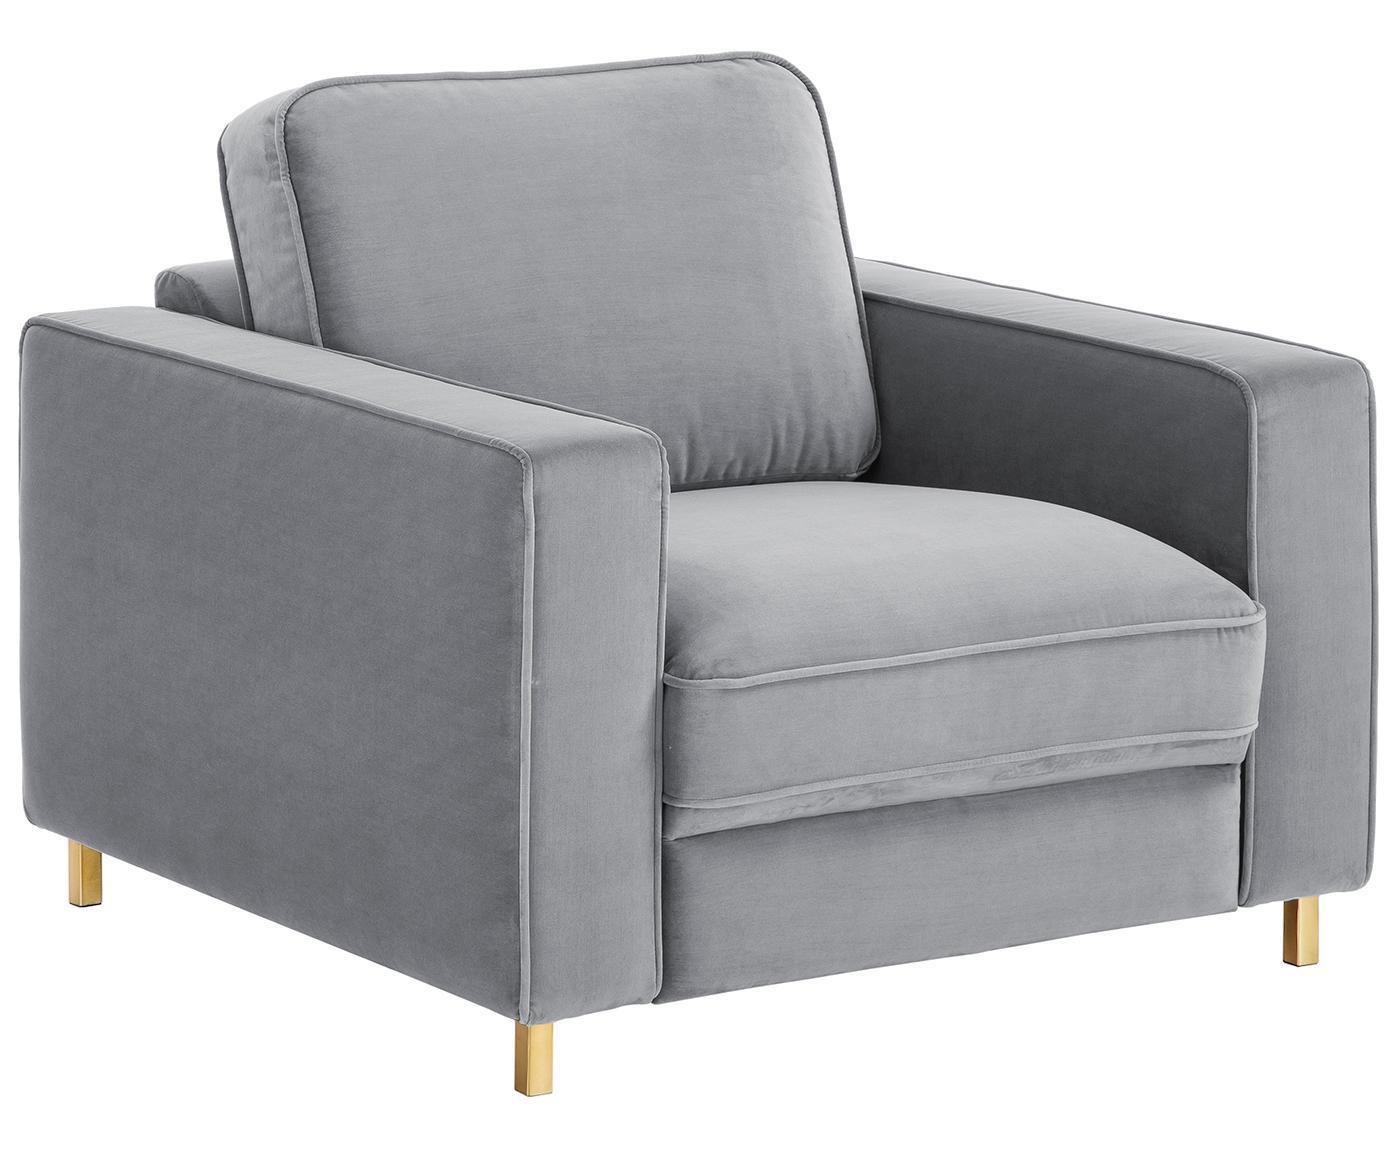 Samt-Sessel Chelsea, Bezug: Samt (Hochwertiger Polyes, Gestell: Massives Fichtenholz, Samt Grau, B 83 x T 93 cm